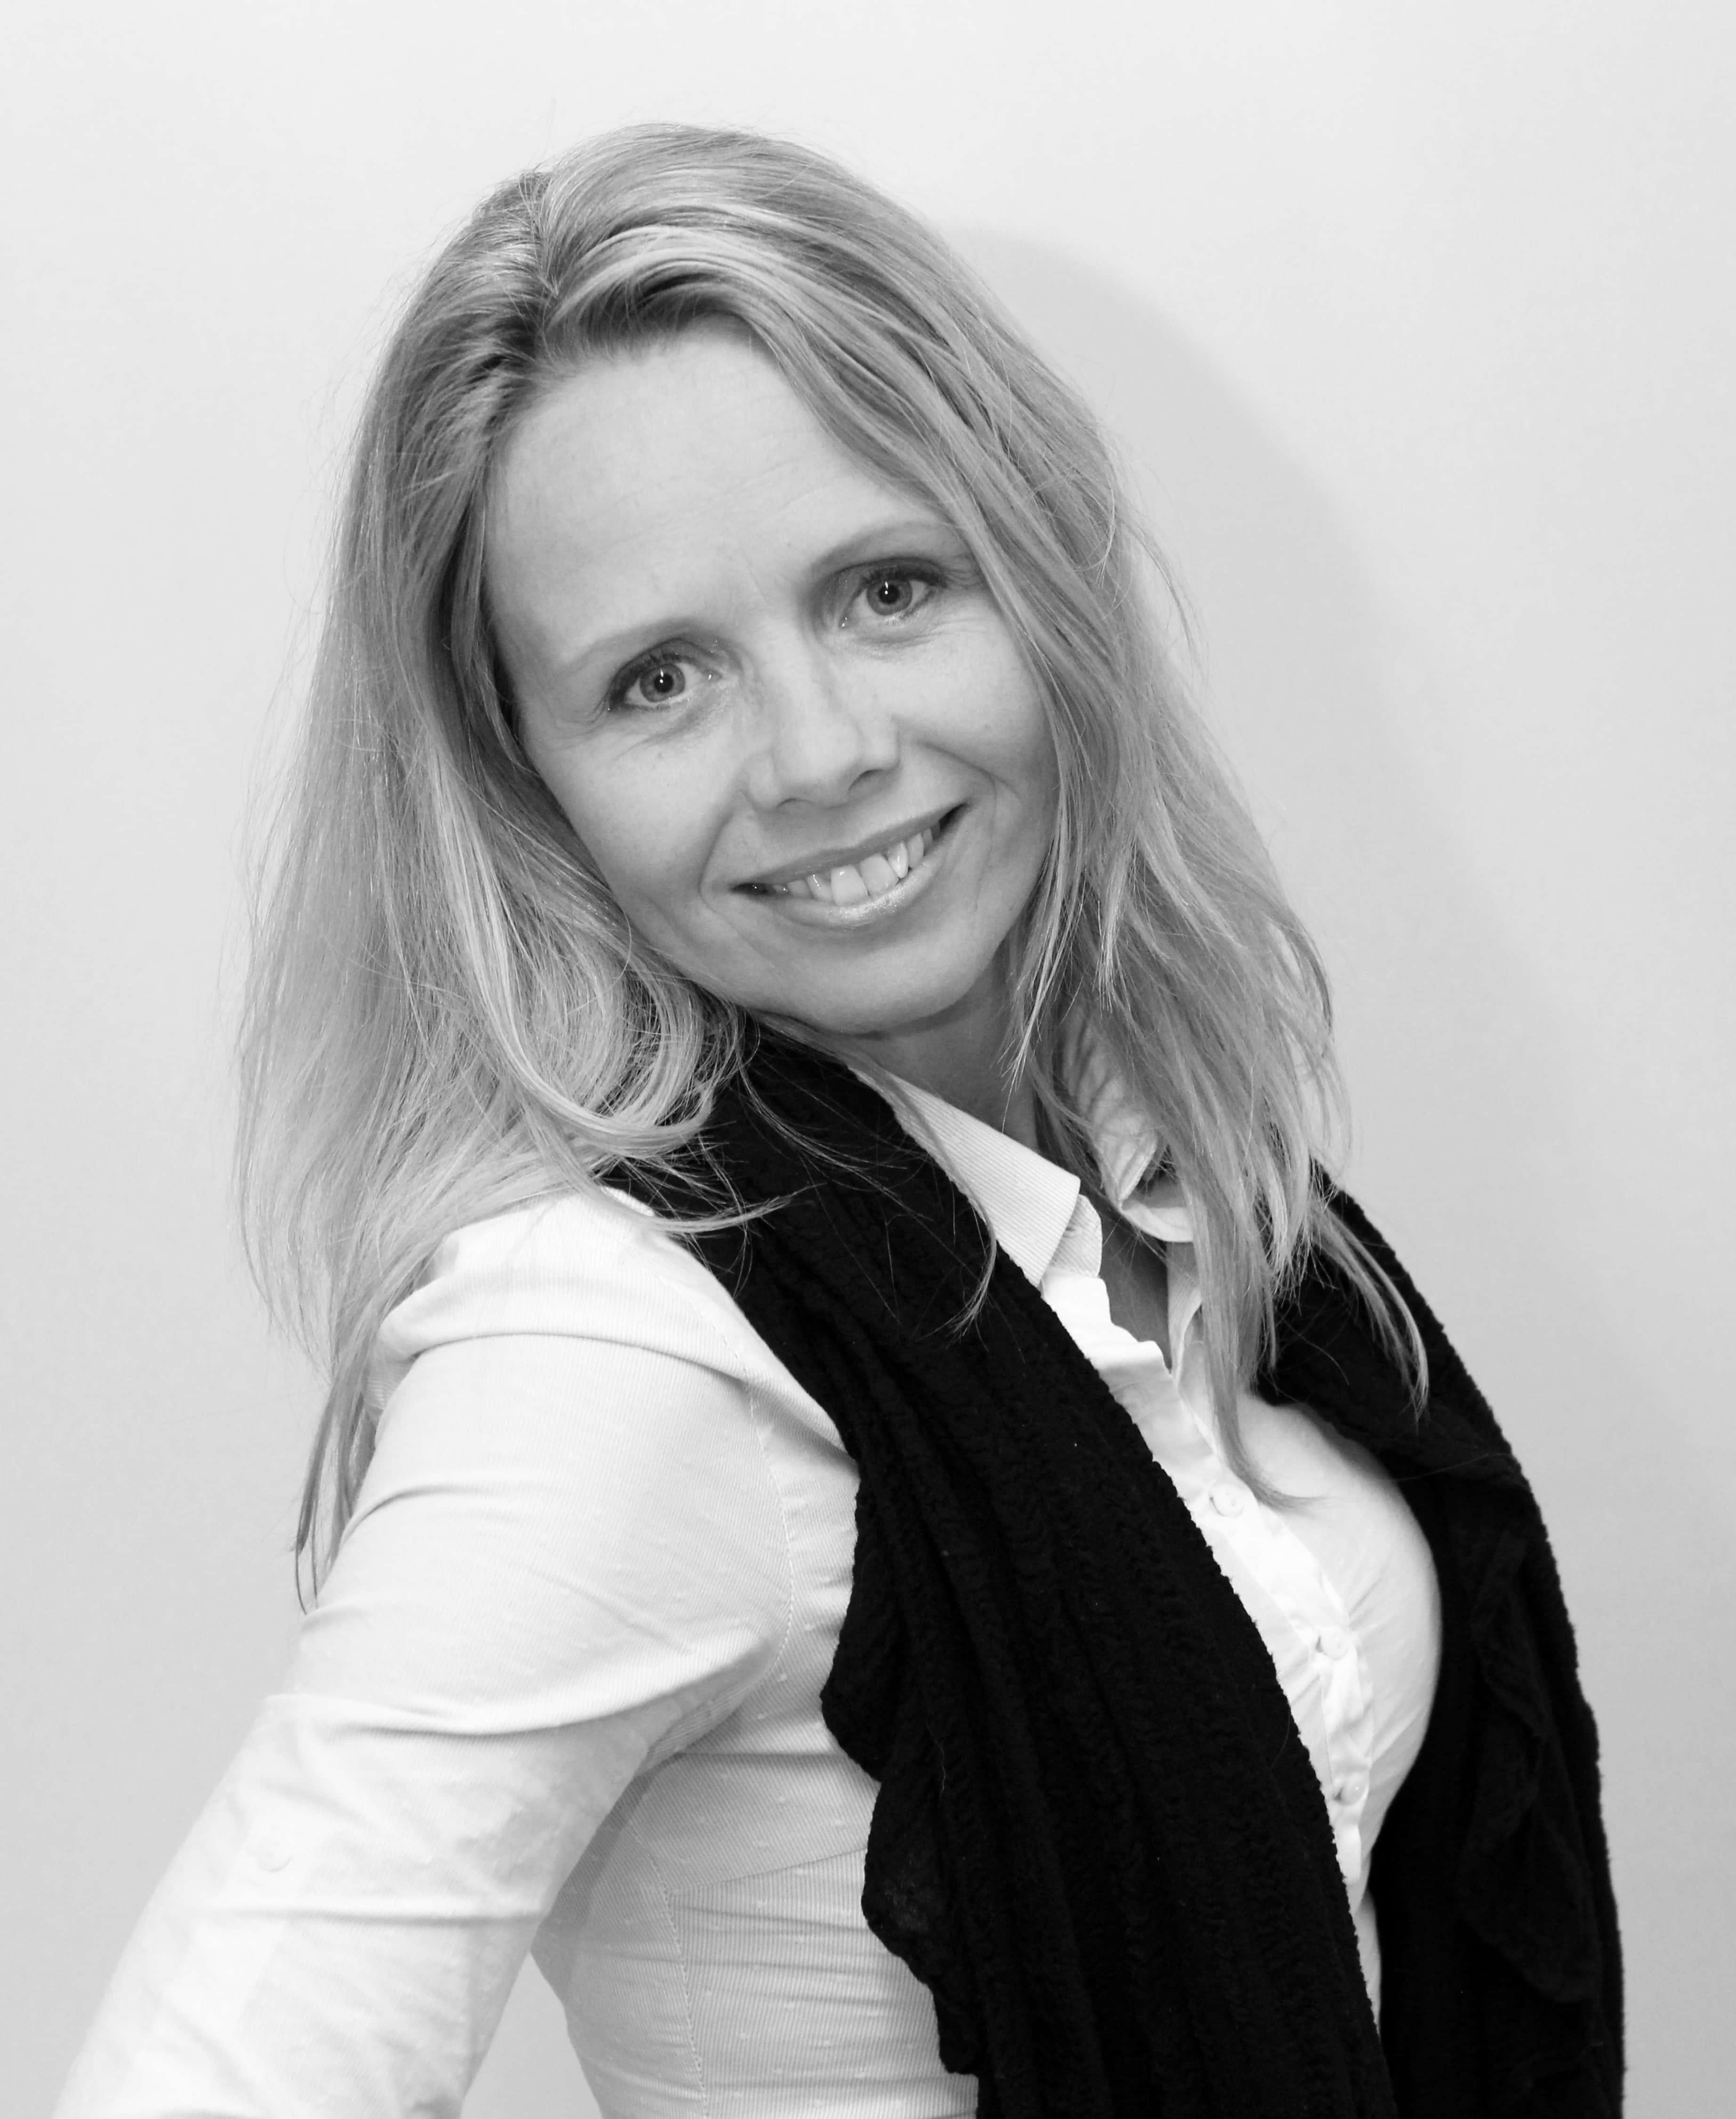 May Britt Løvik